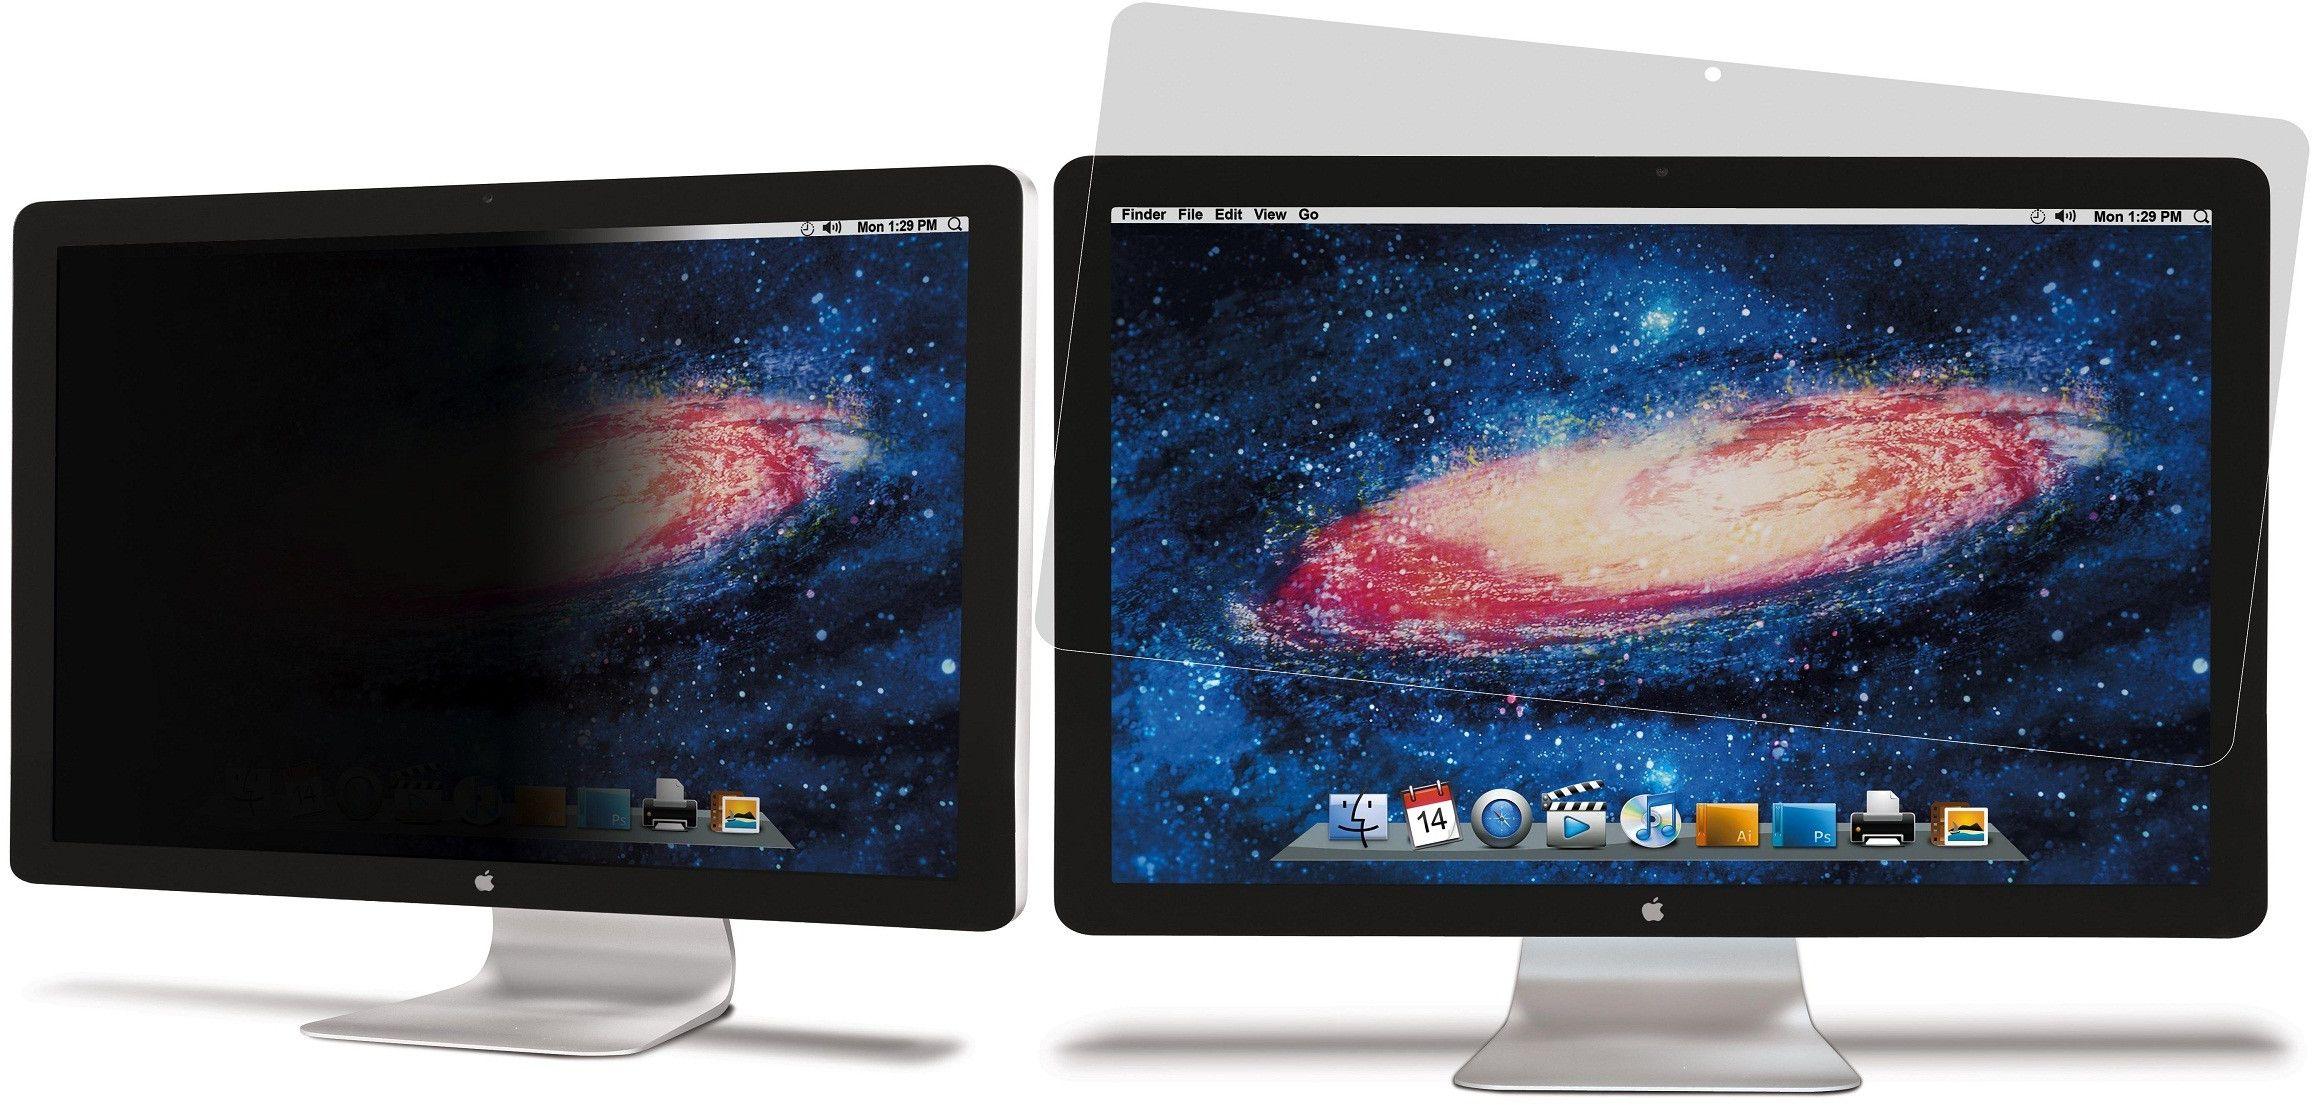 Filtr Prywatyzujący 3M  PFMT27 do monitora Apple  Thunderbolt 27'' DYSTRYBUTOR 3M 98044055287